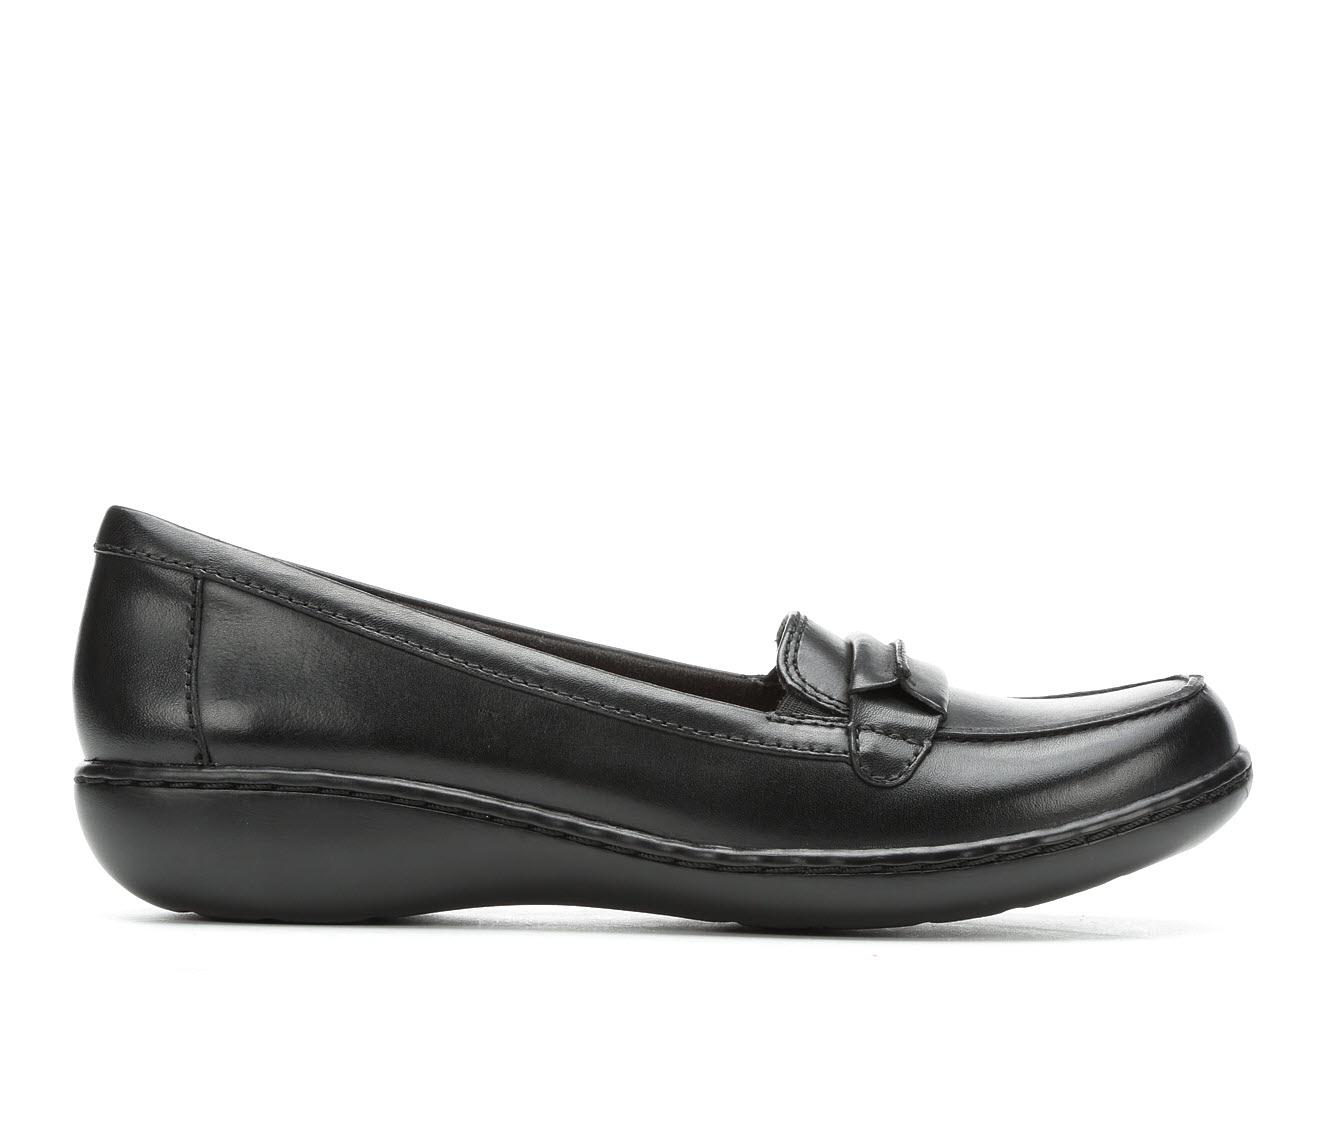 Clarks Ashland Lily Women's Shoe (Black Leather)